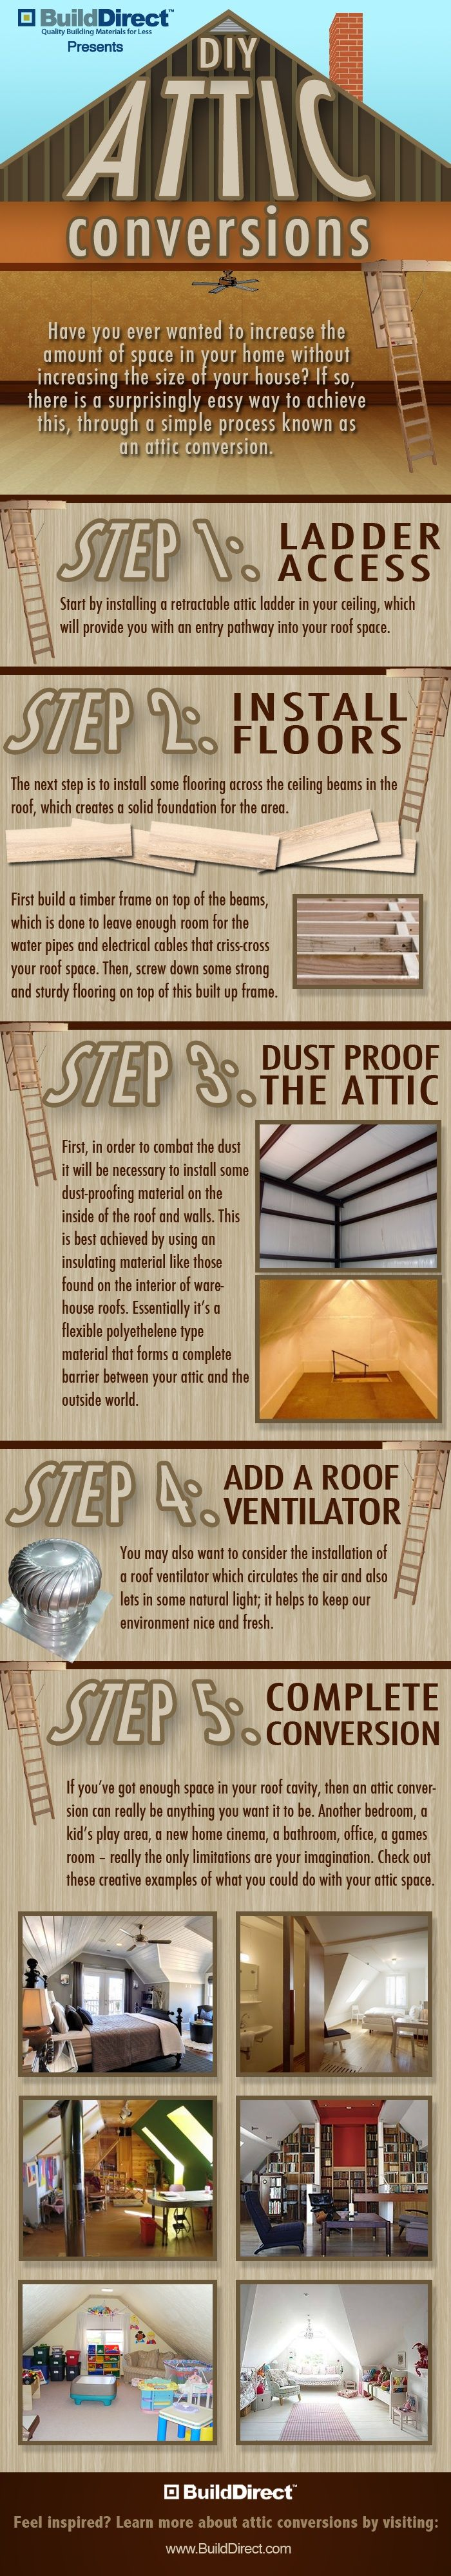 Diy Attic Conversions Building Value Attic Conversion Attic Rooms Attic Renovation